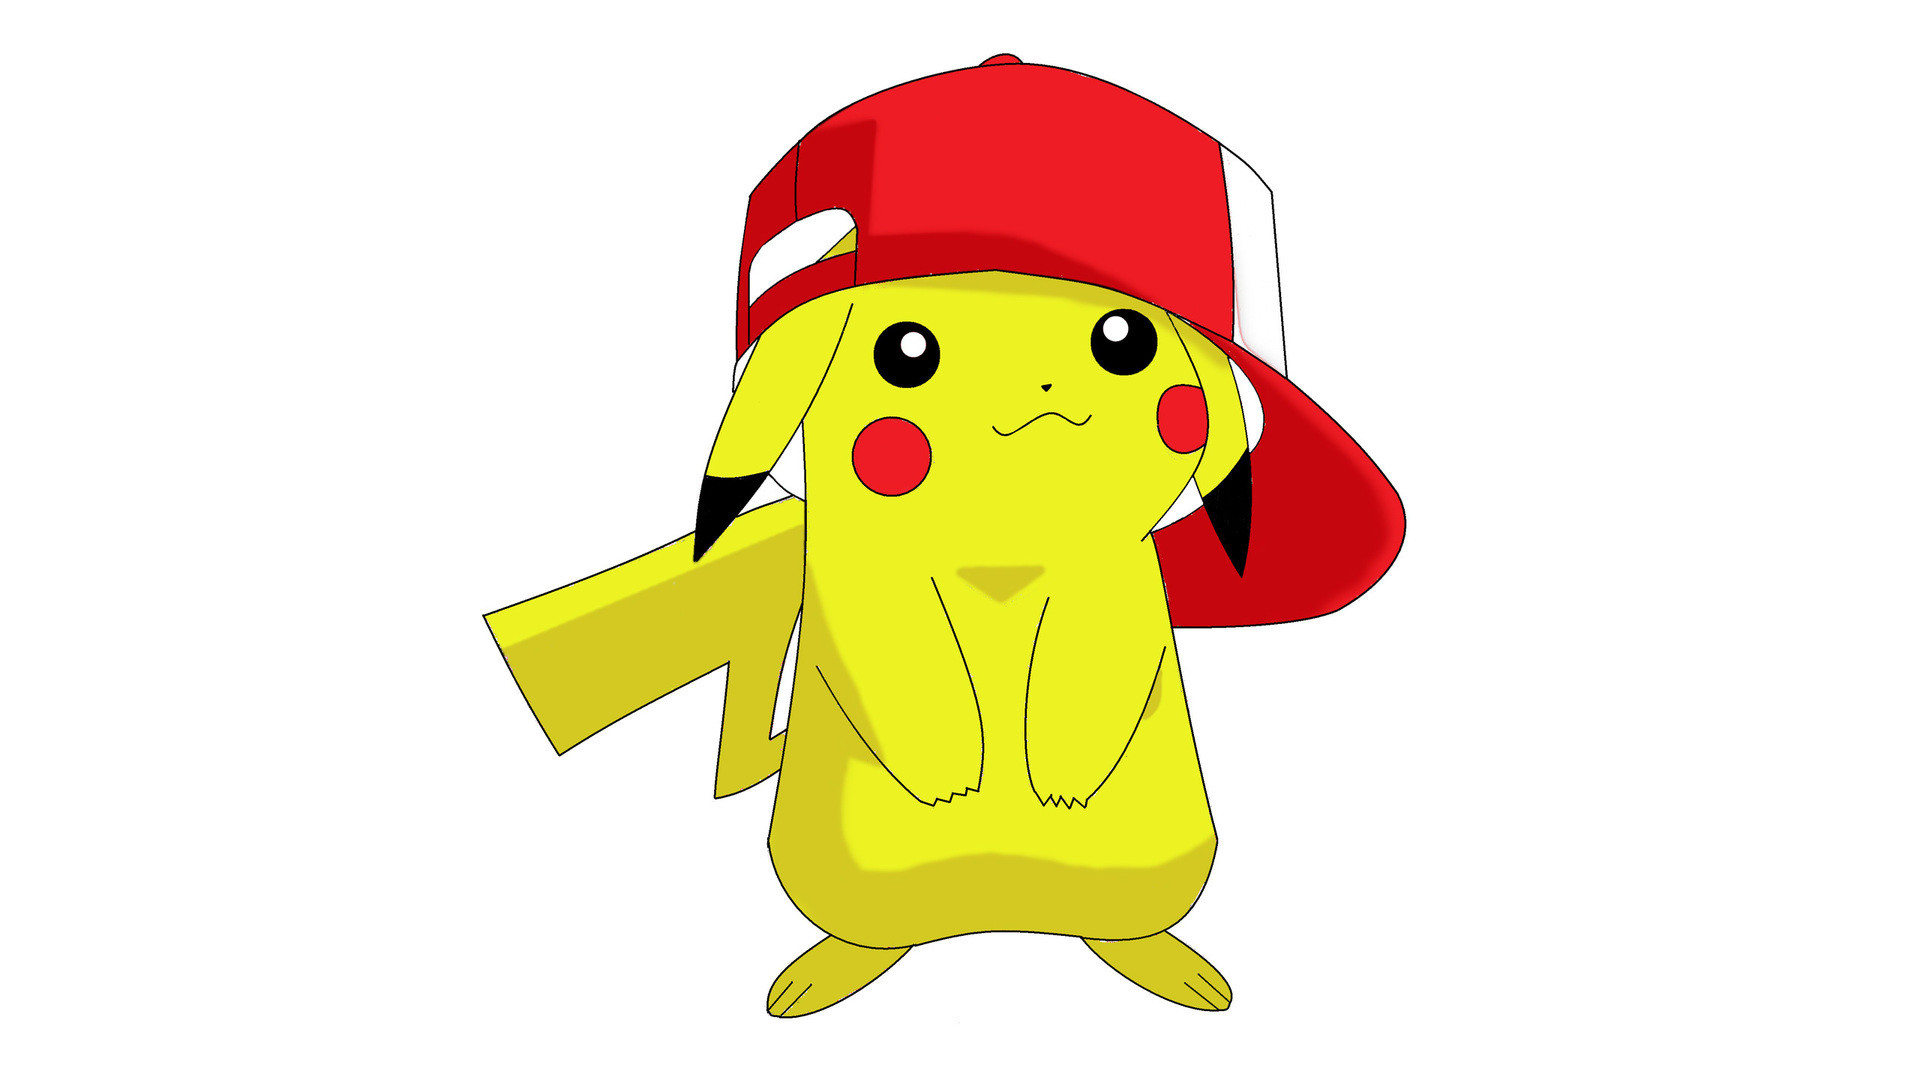 Pikachu Hd Wallpaper 81 Images